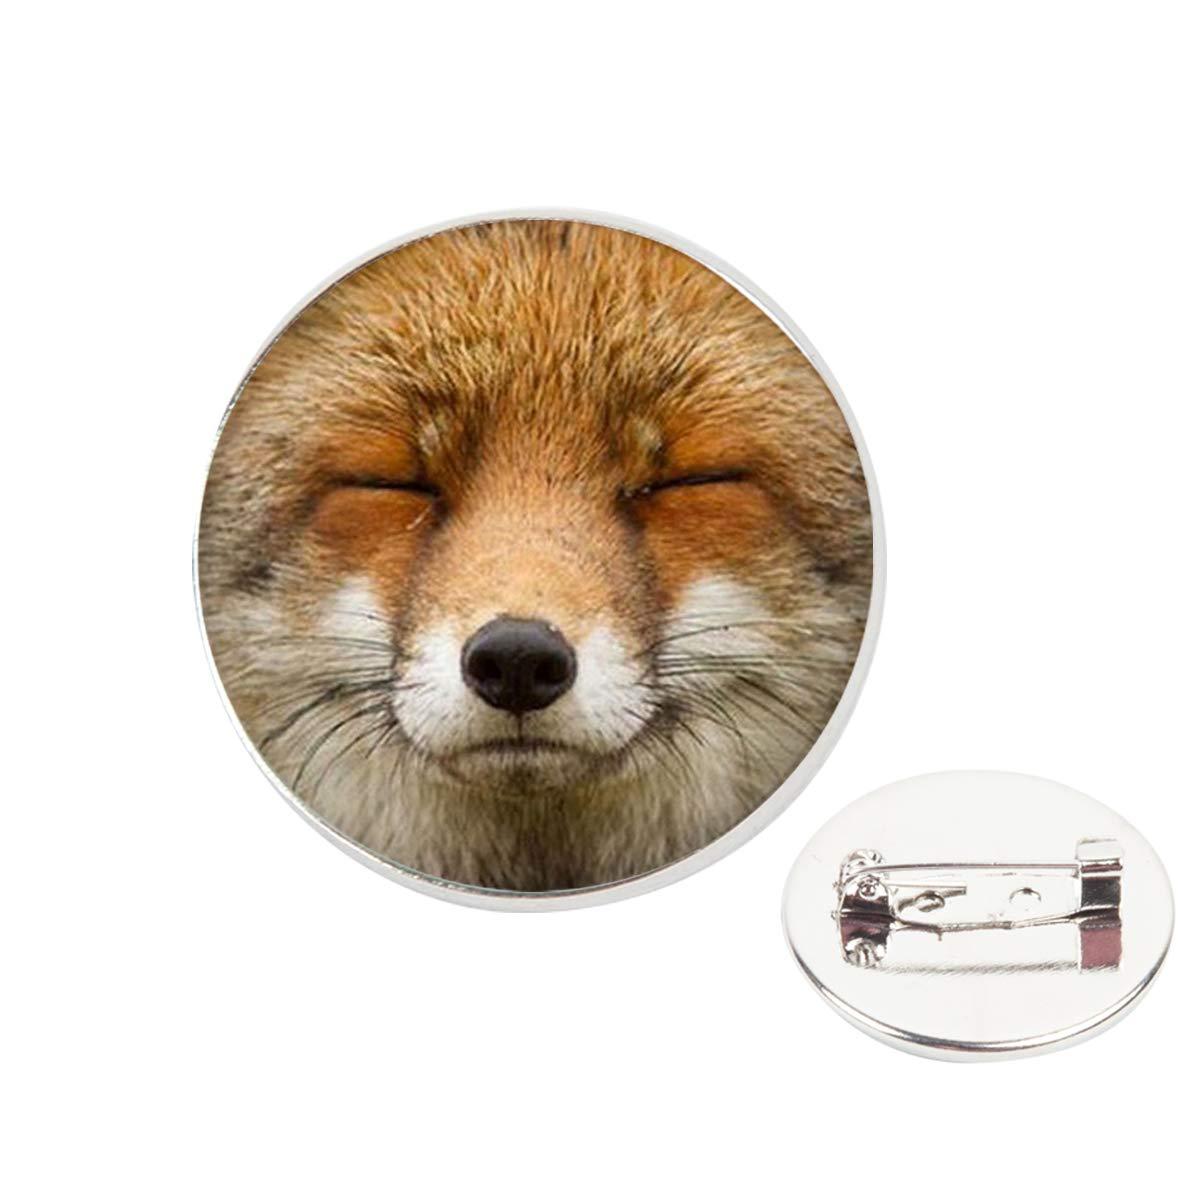 Pinback Buttons Badges Pins Cute Fox Lapel Pin Brooch Clip Trendy Accessory Jacket T-Shirt Bag Hat Shoe